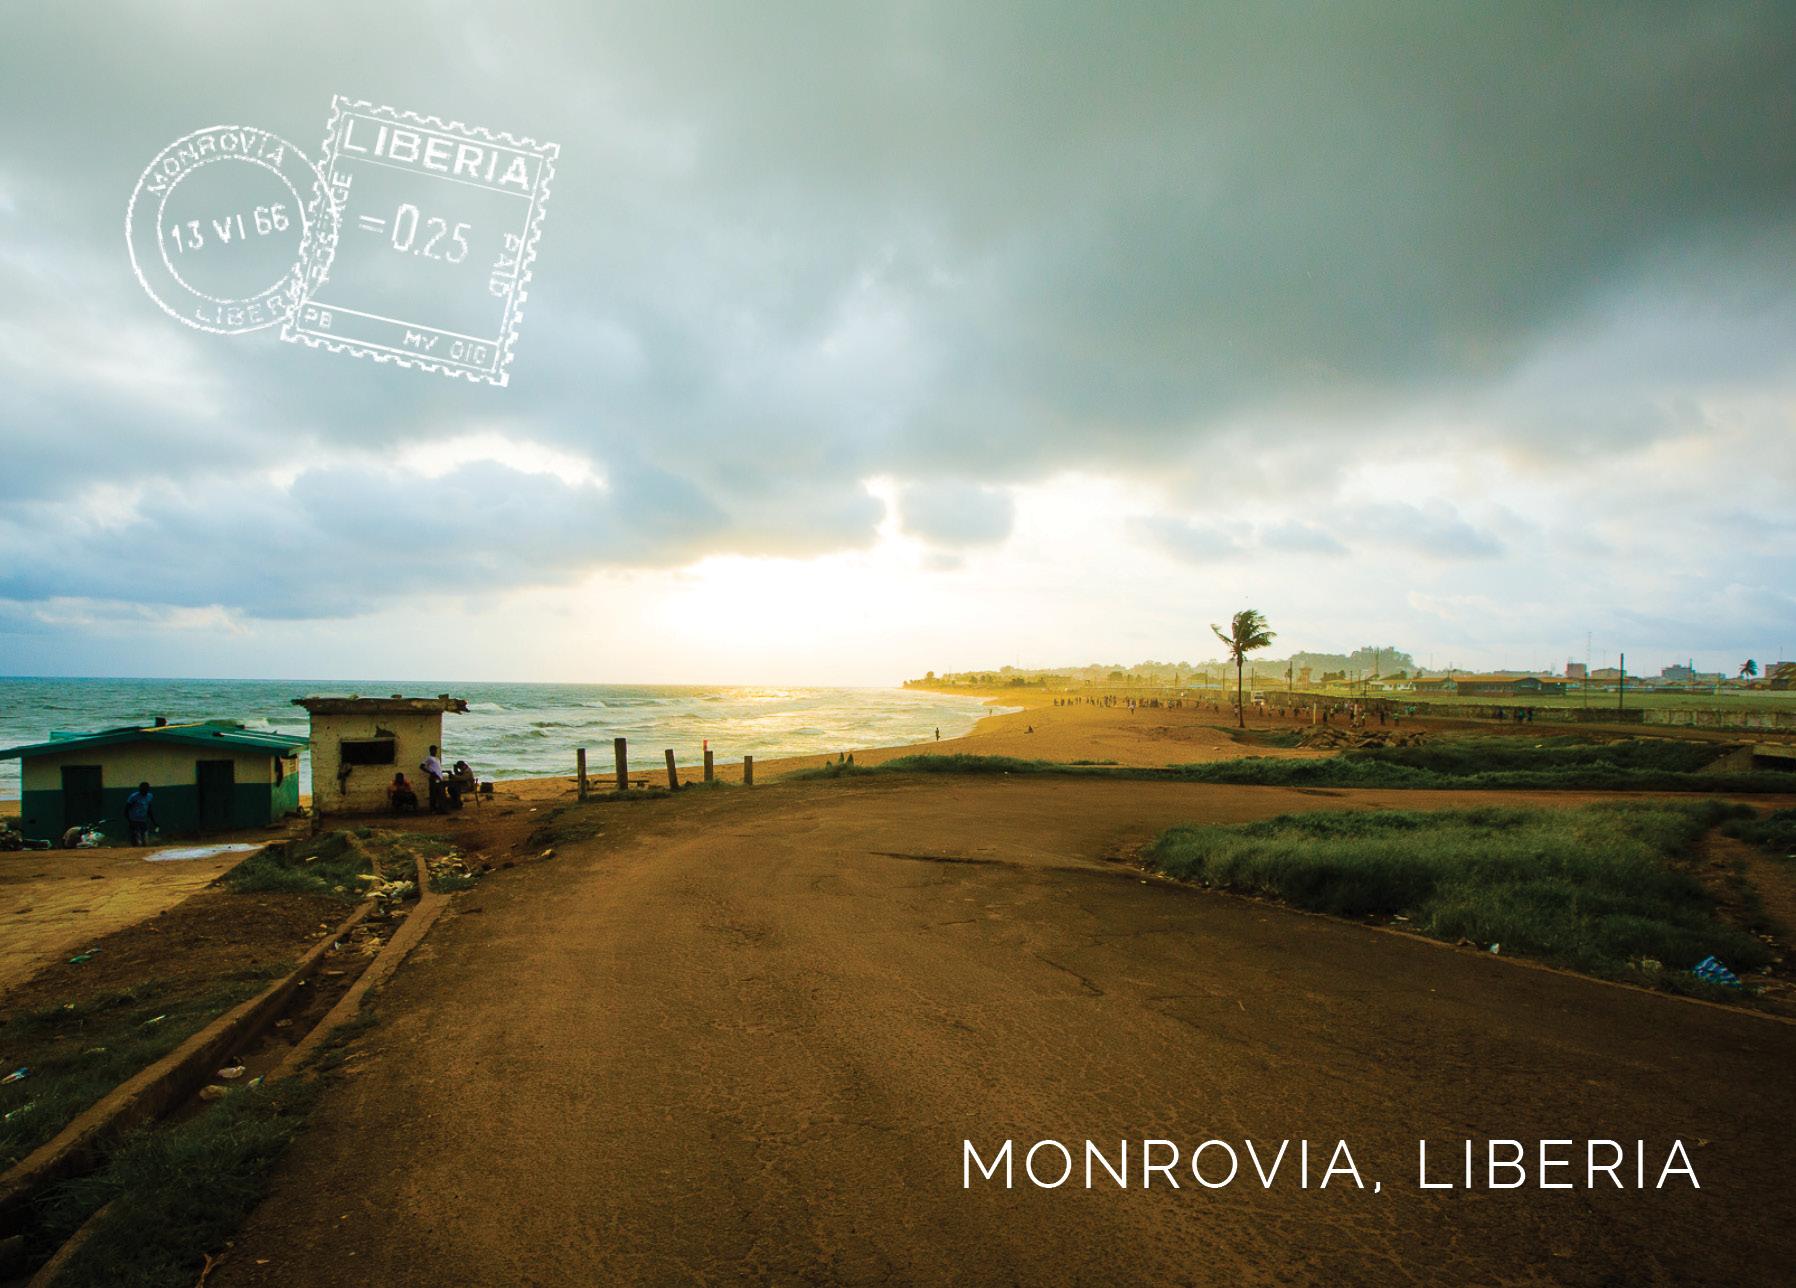 mo-postcards-7.jpg